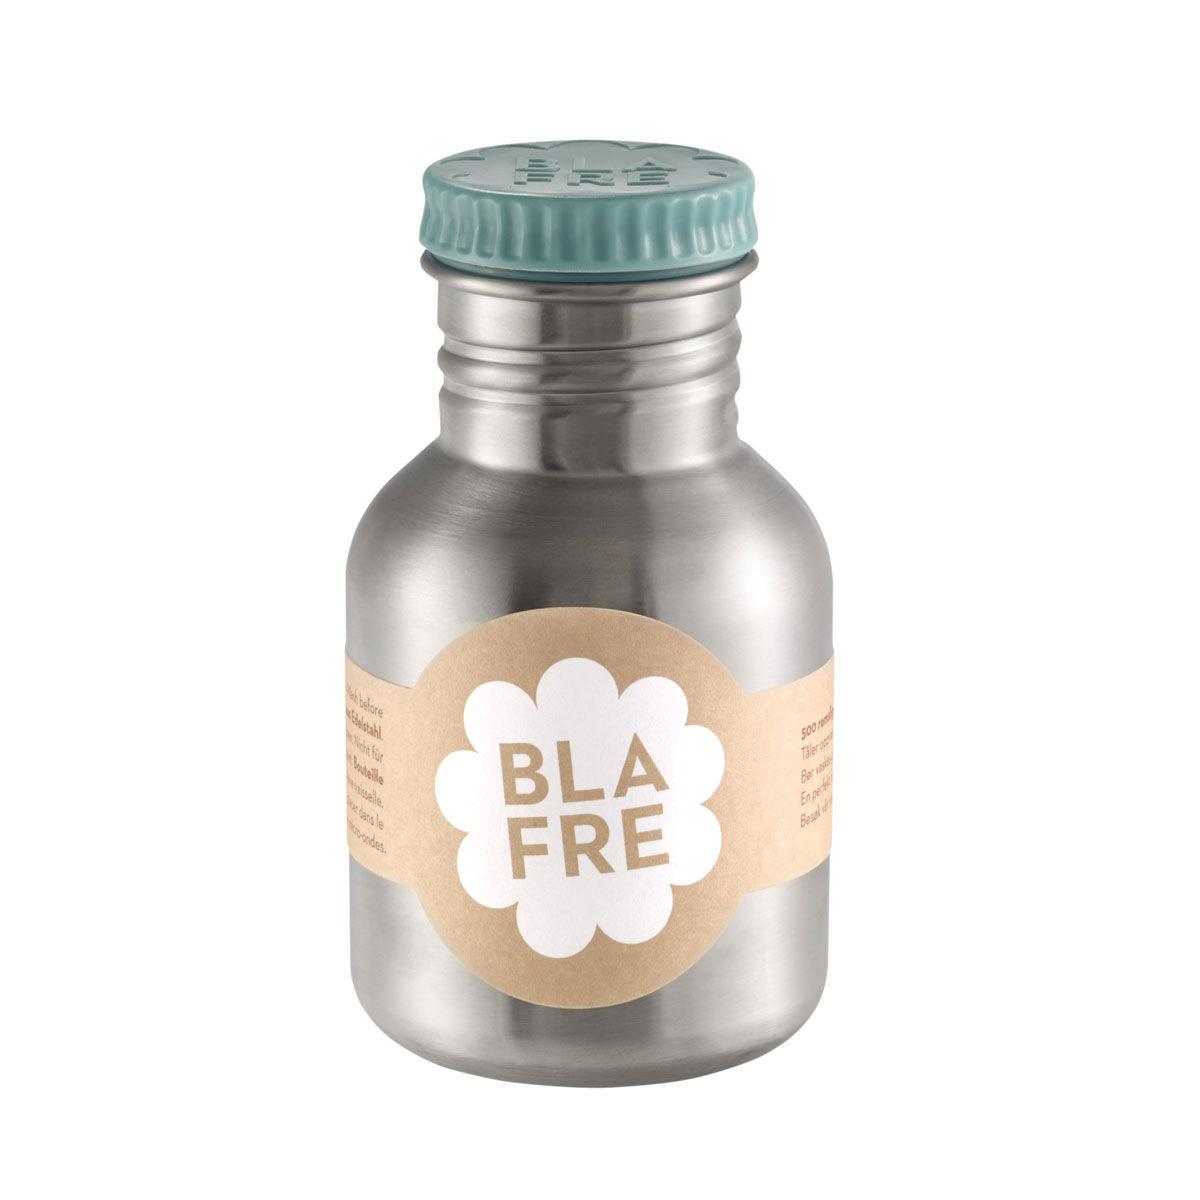 Blafre stålflaske til barn 300 ml. blågrønn